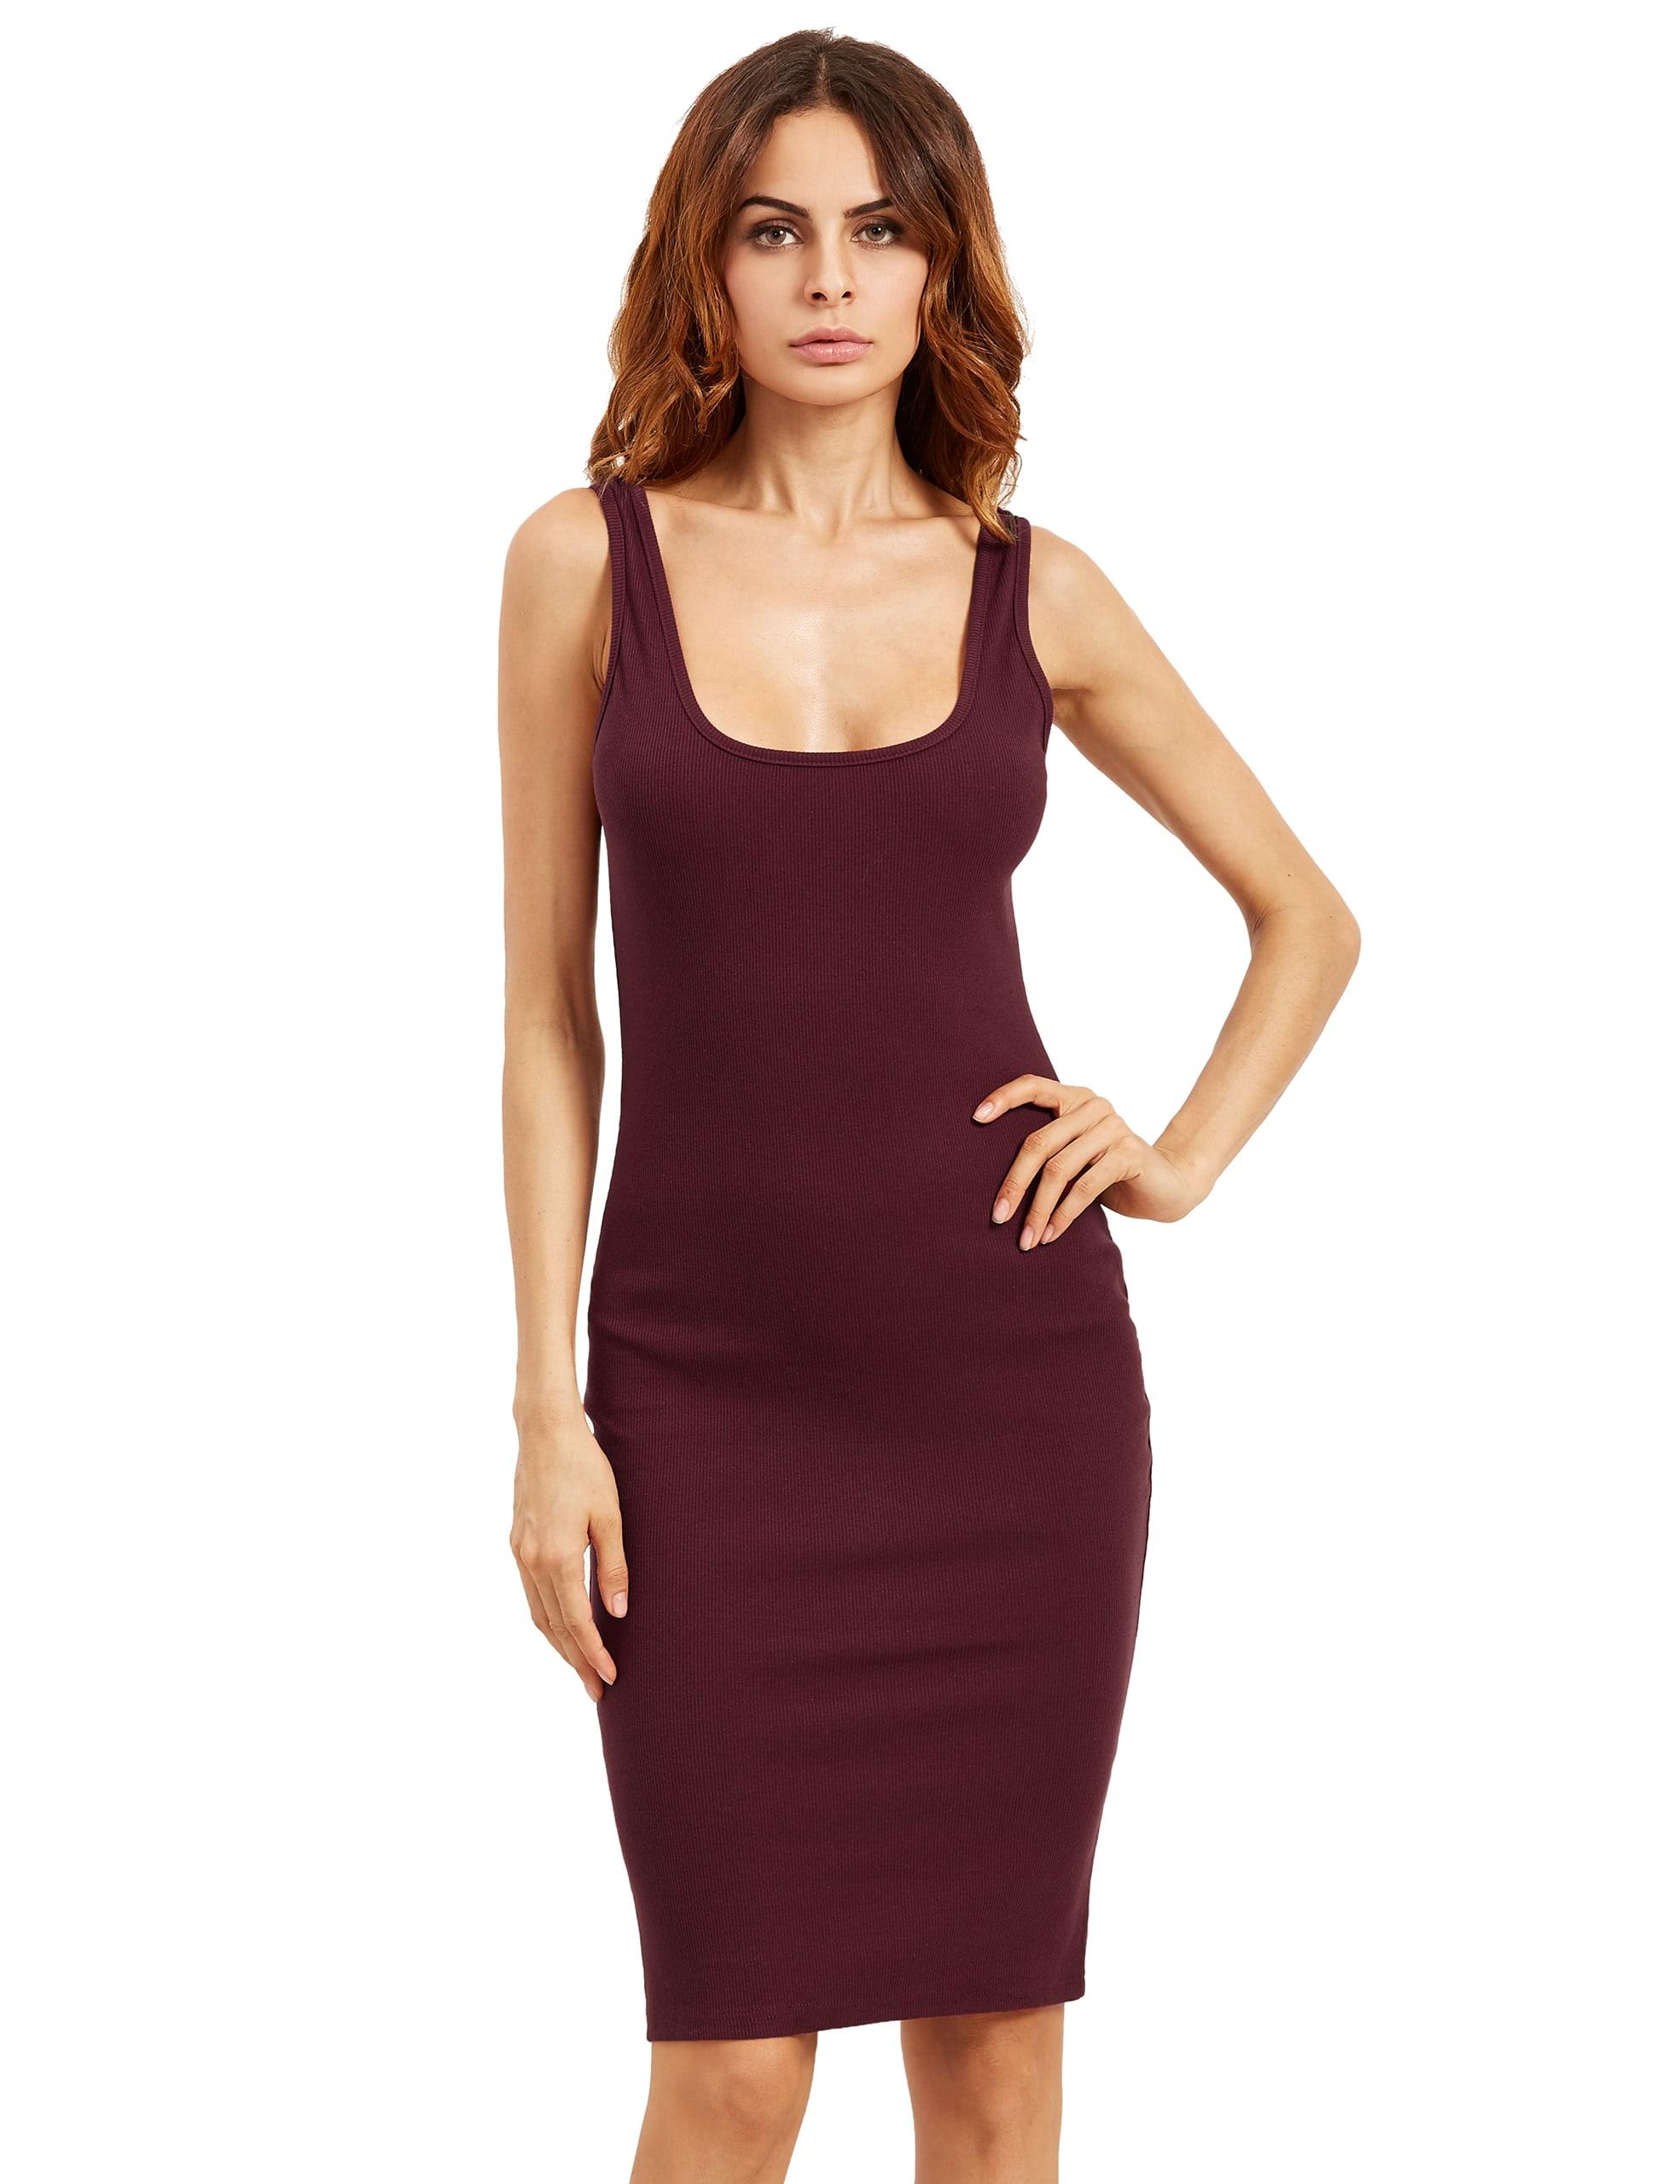 Burgundy Sleeveless U Neck Bodycon Dress dress160808757